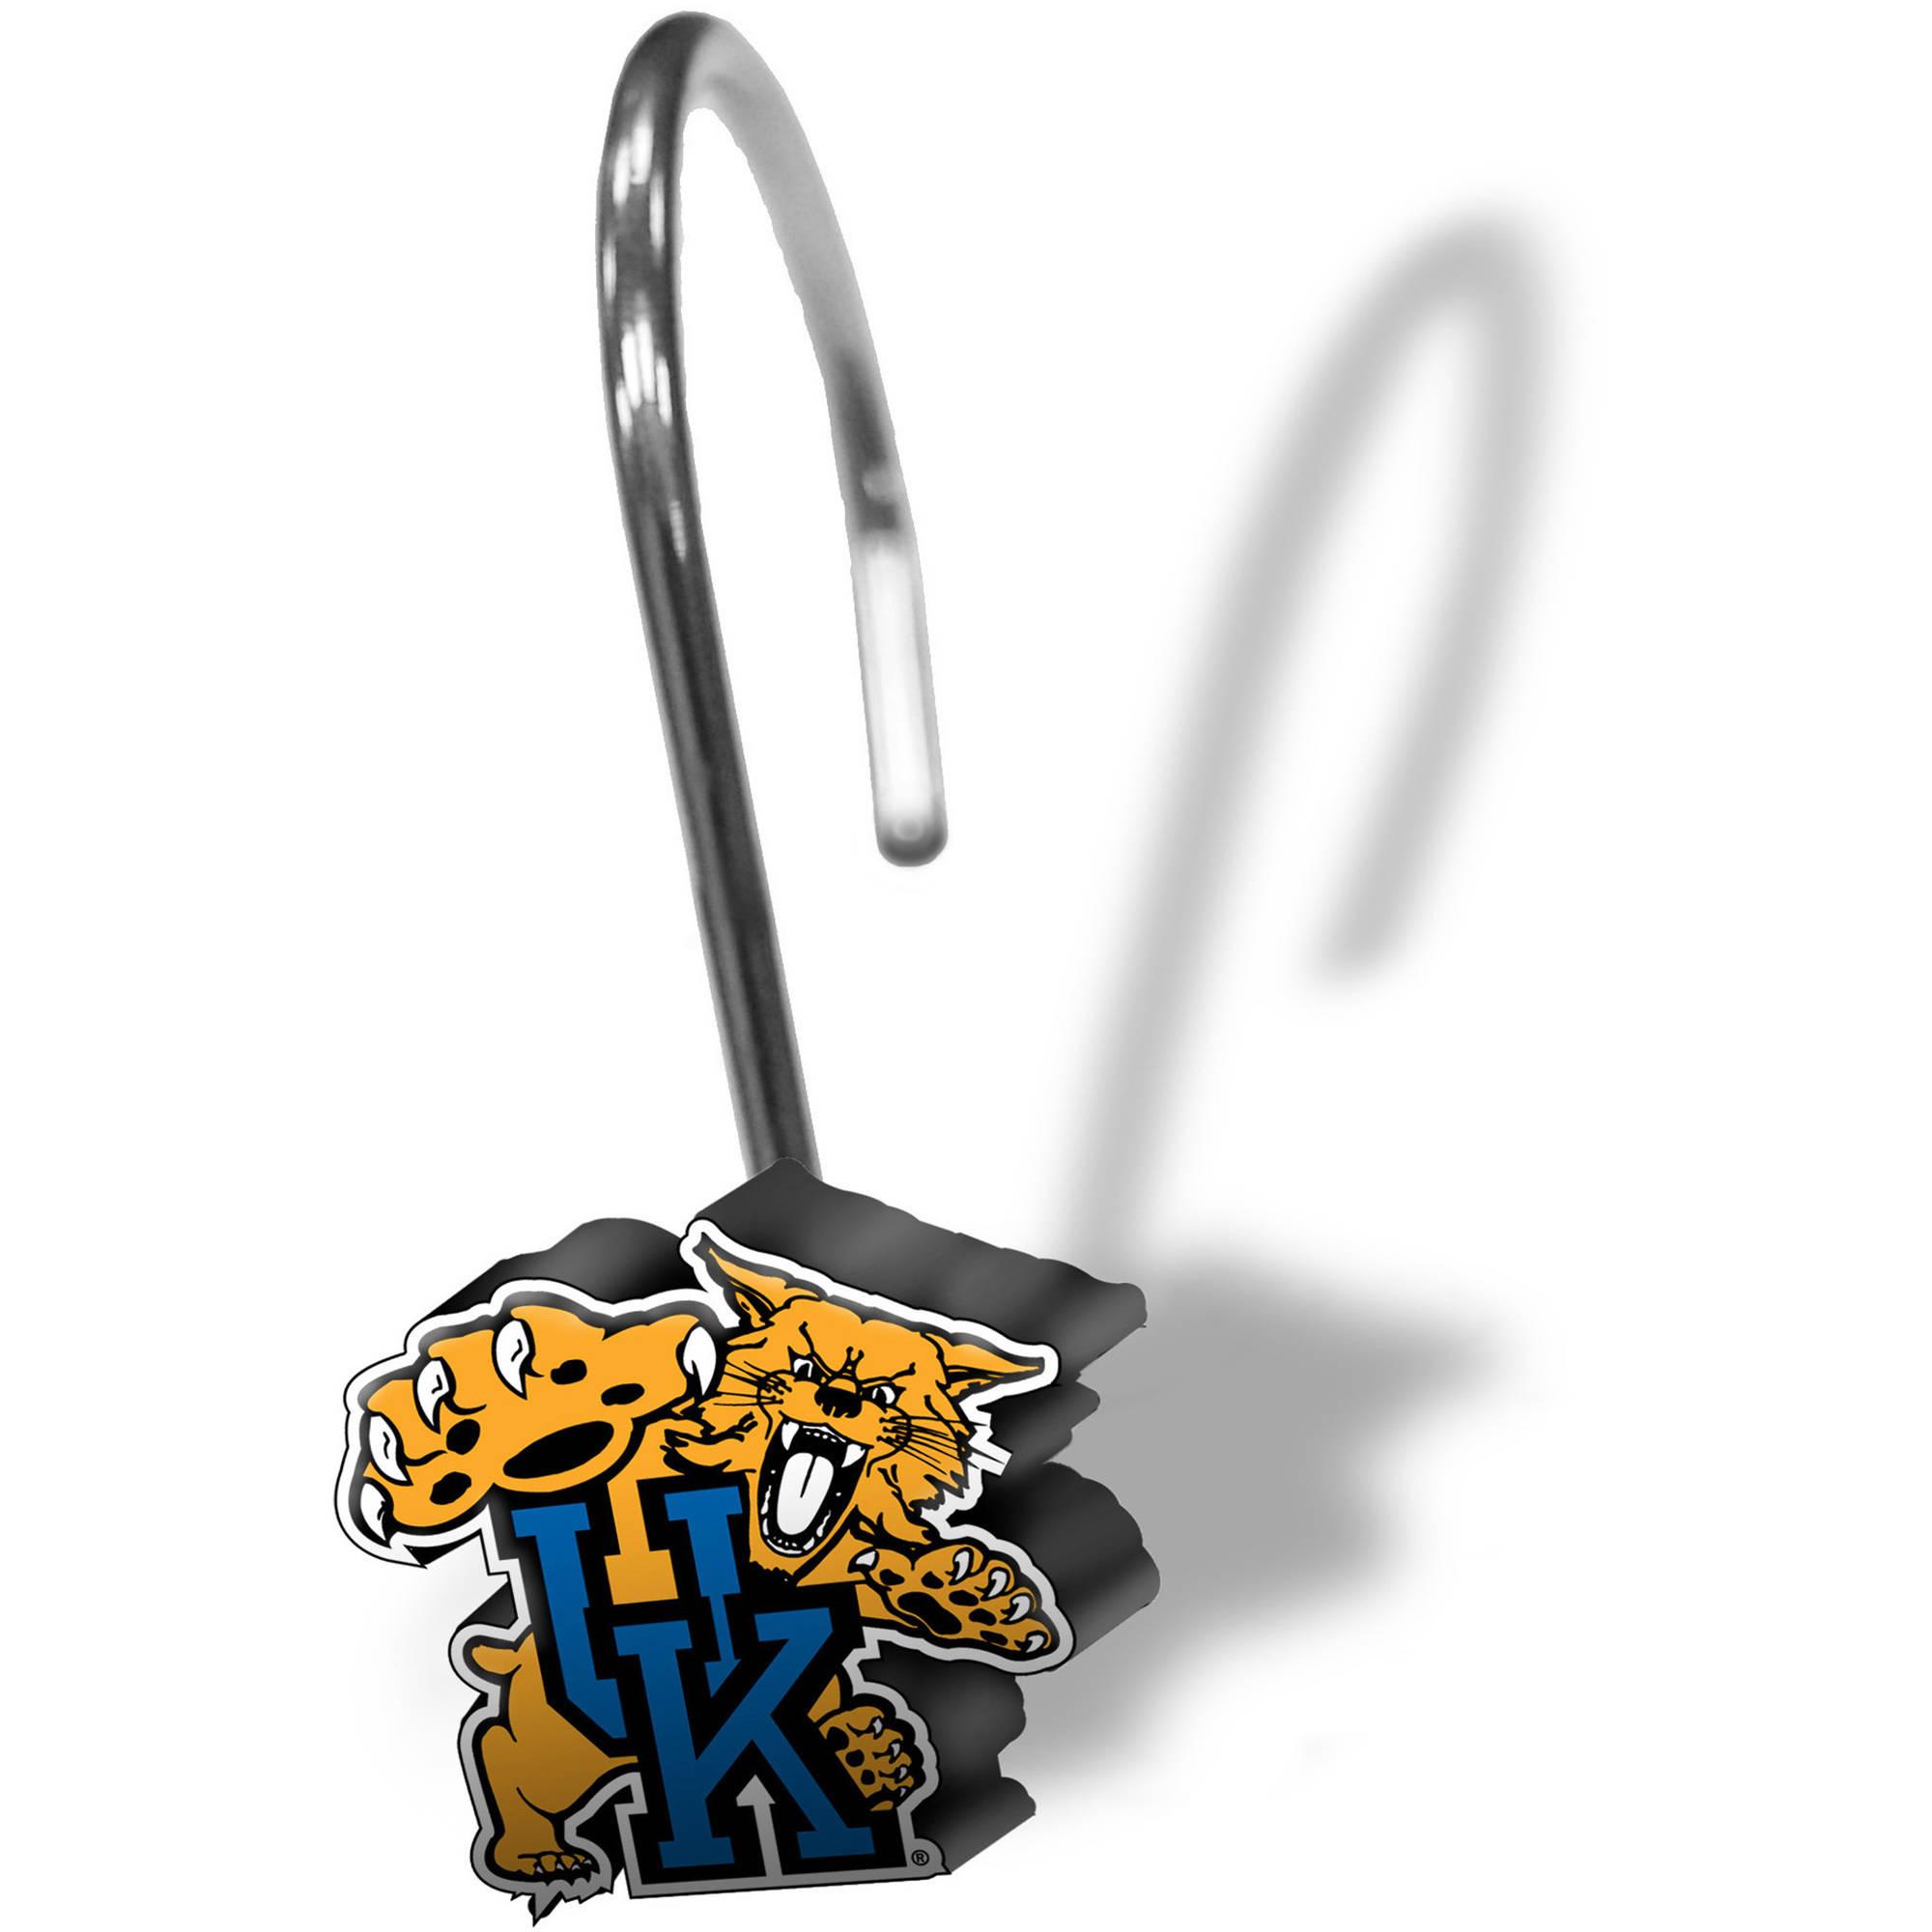 NCAA University of Kentucky Decorative Bath Collection - 12pc Shower Hooks